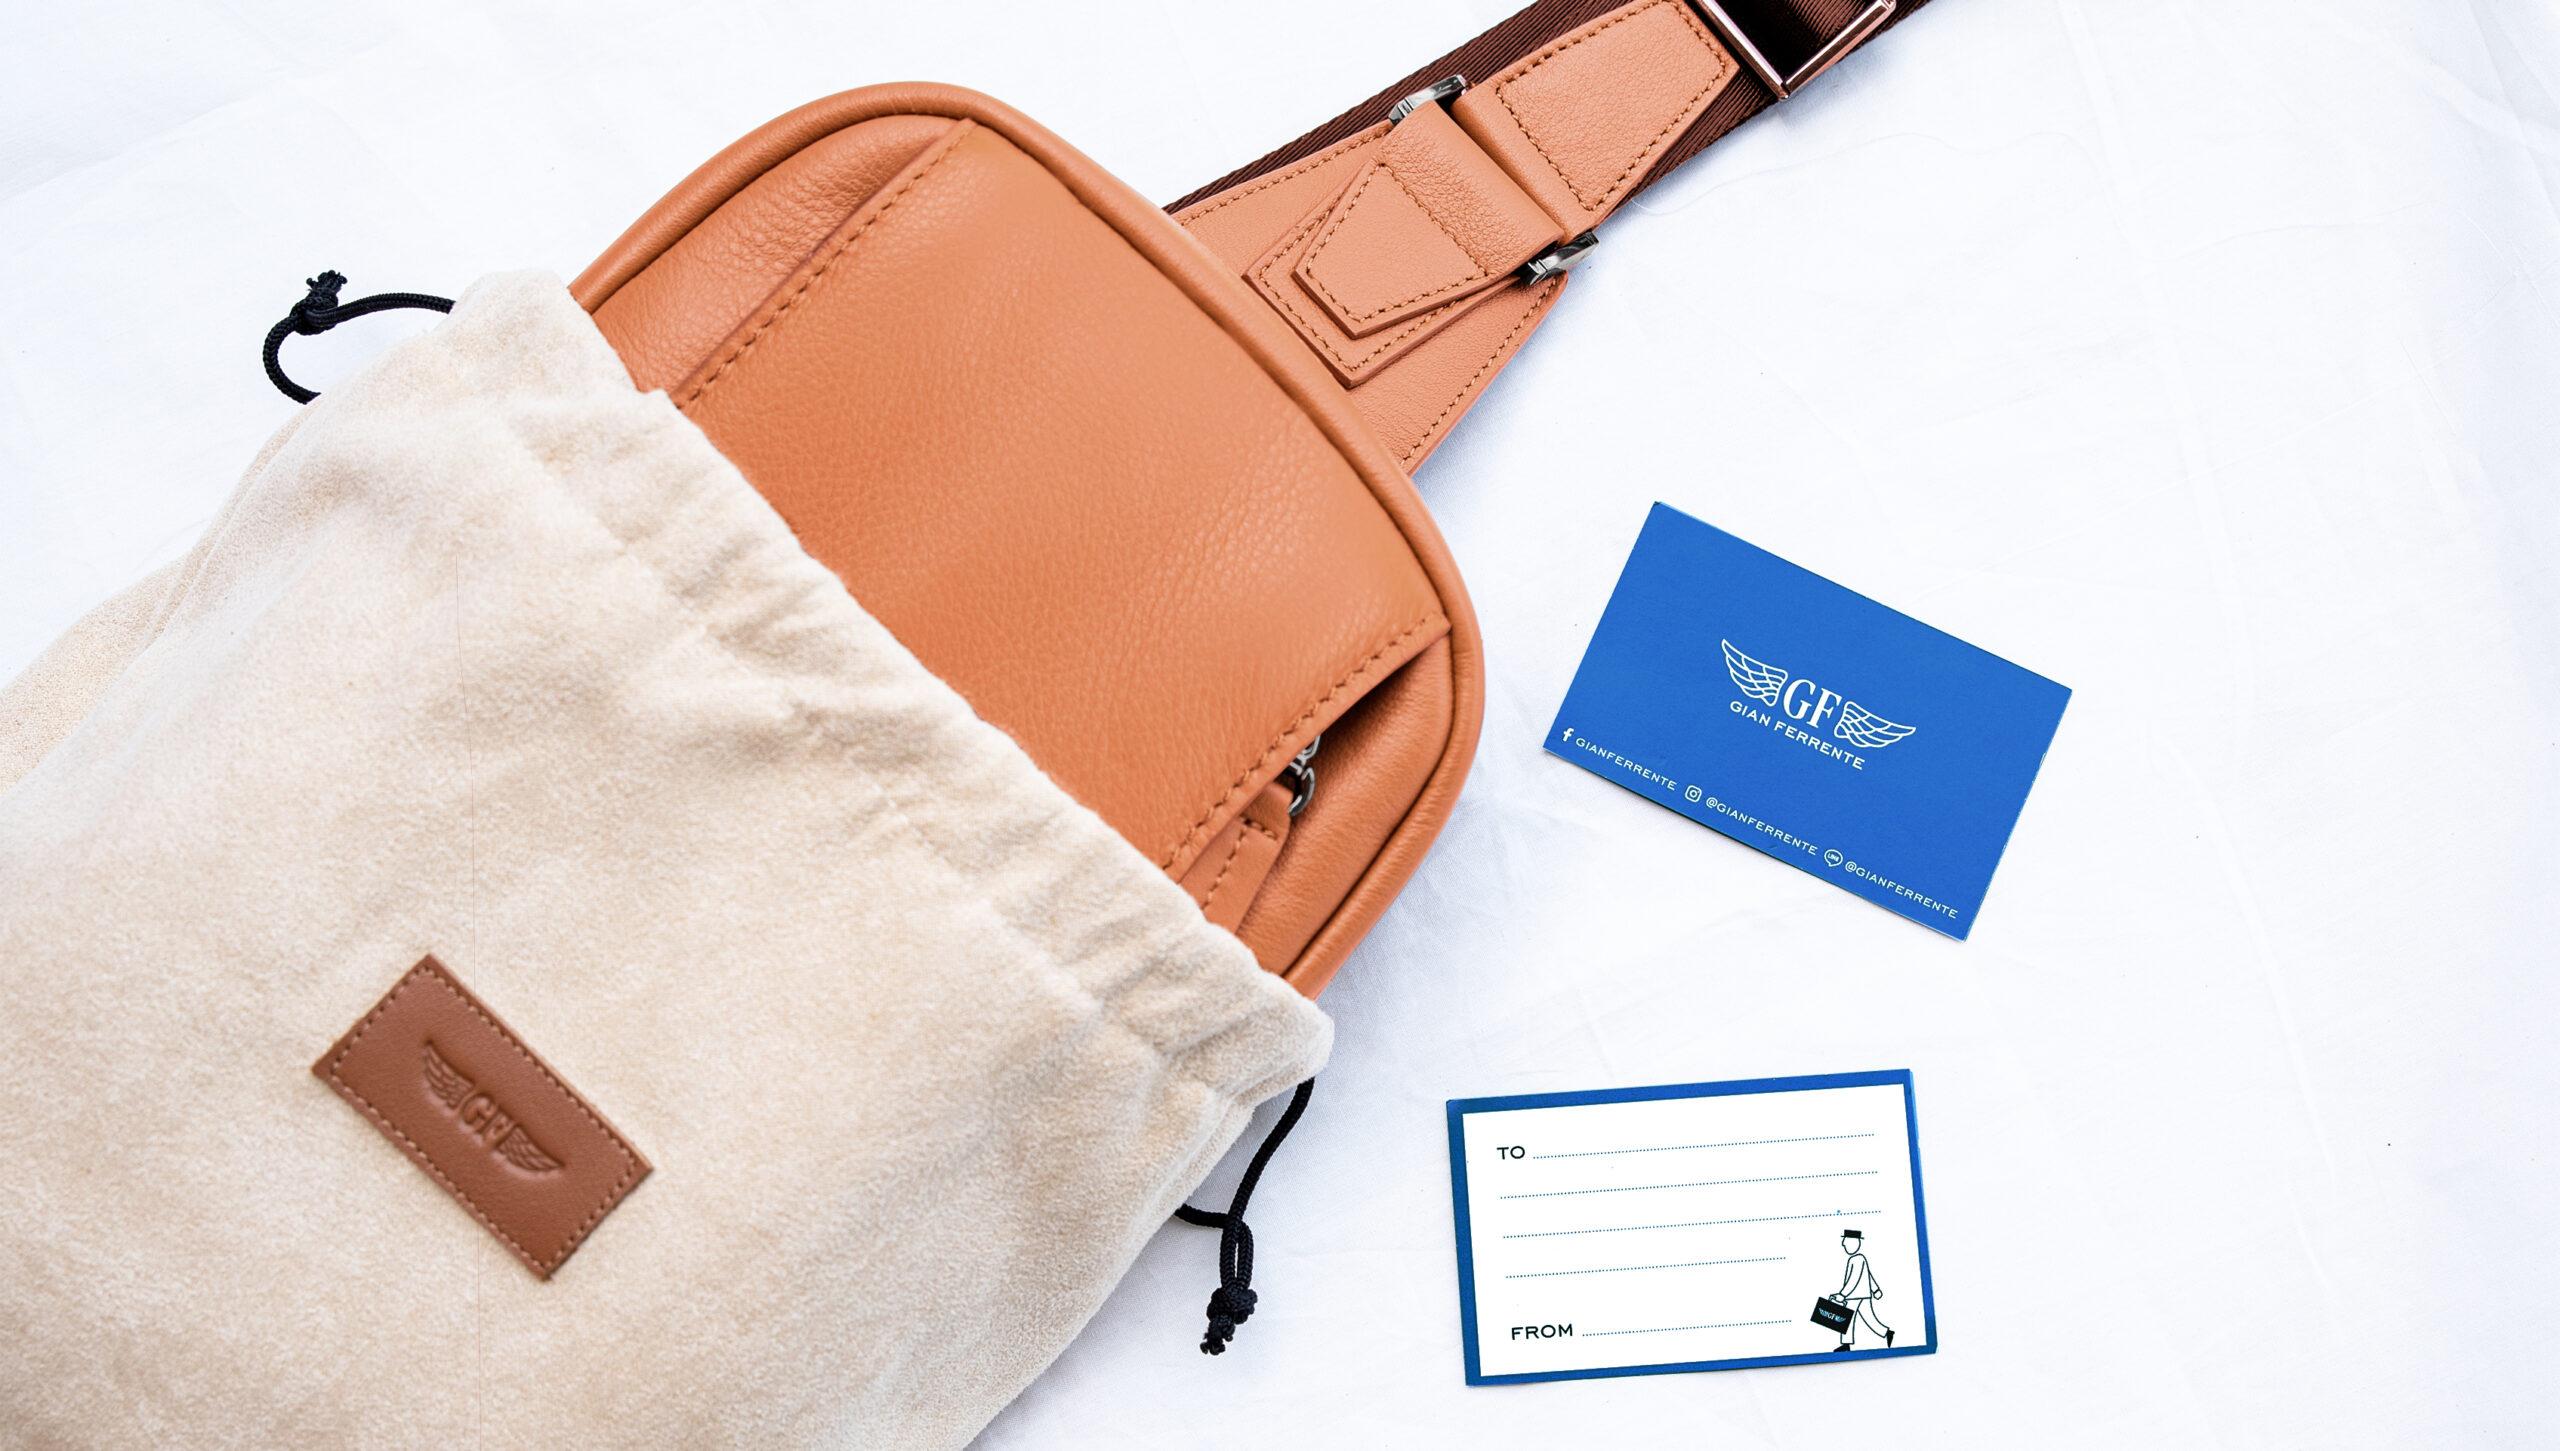 Bag Gift Wrapping